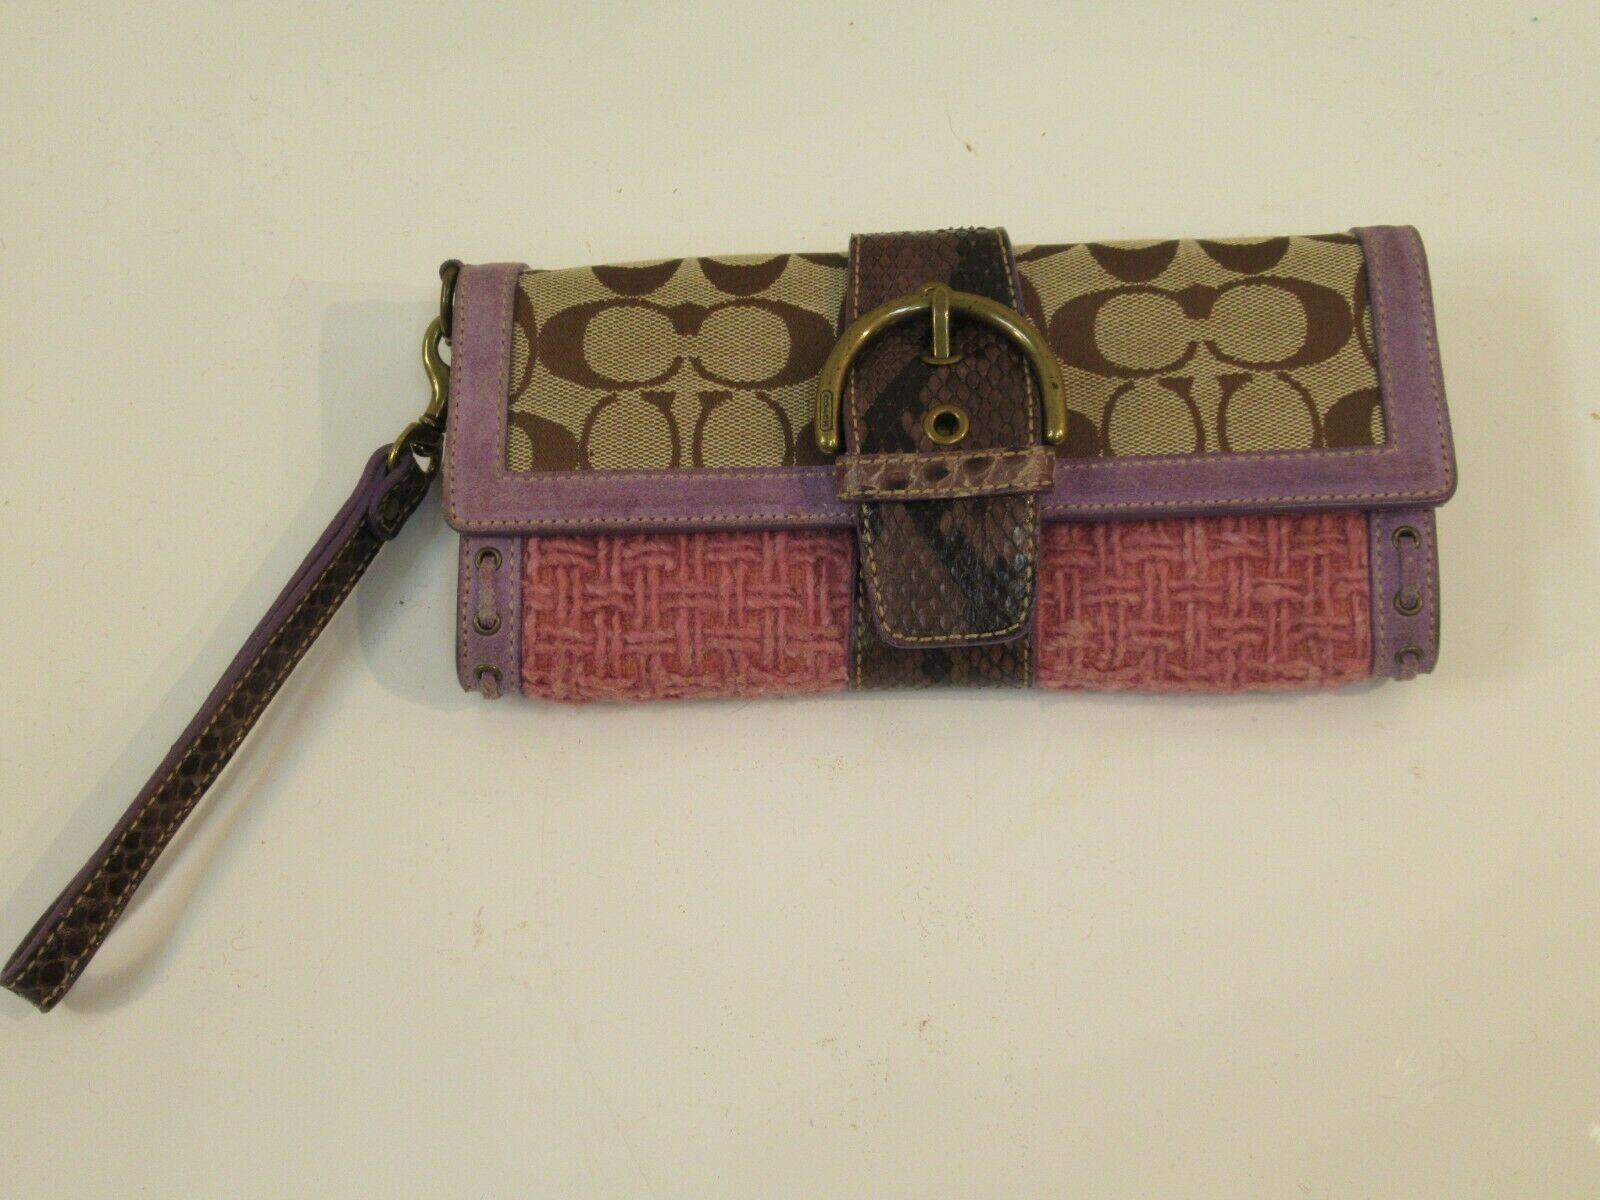 Coach Wristlet Tweed Purple Suede Wallet Buckle Handbag Clutch Monogram C image 2